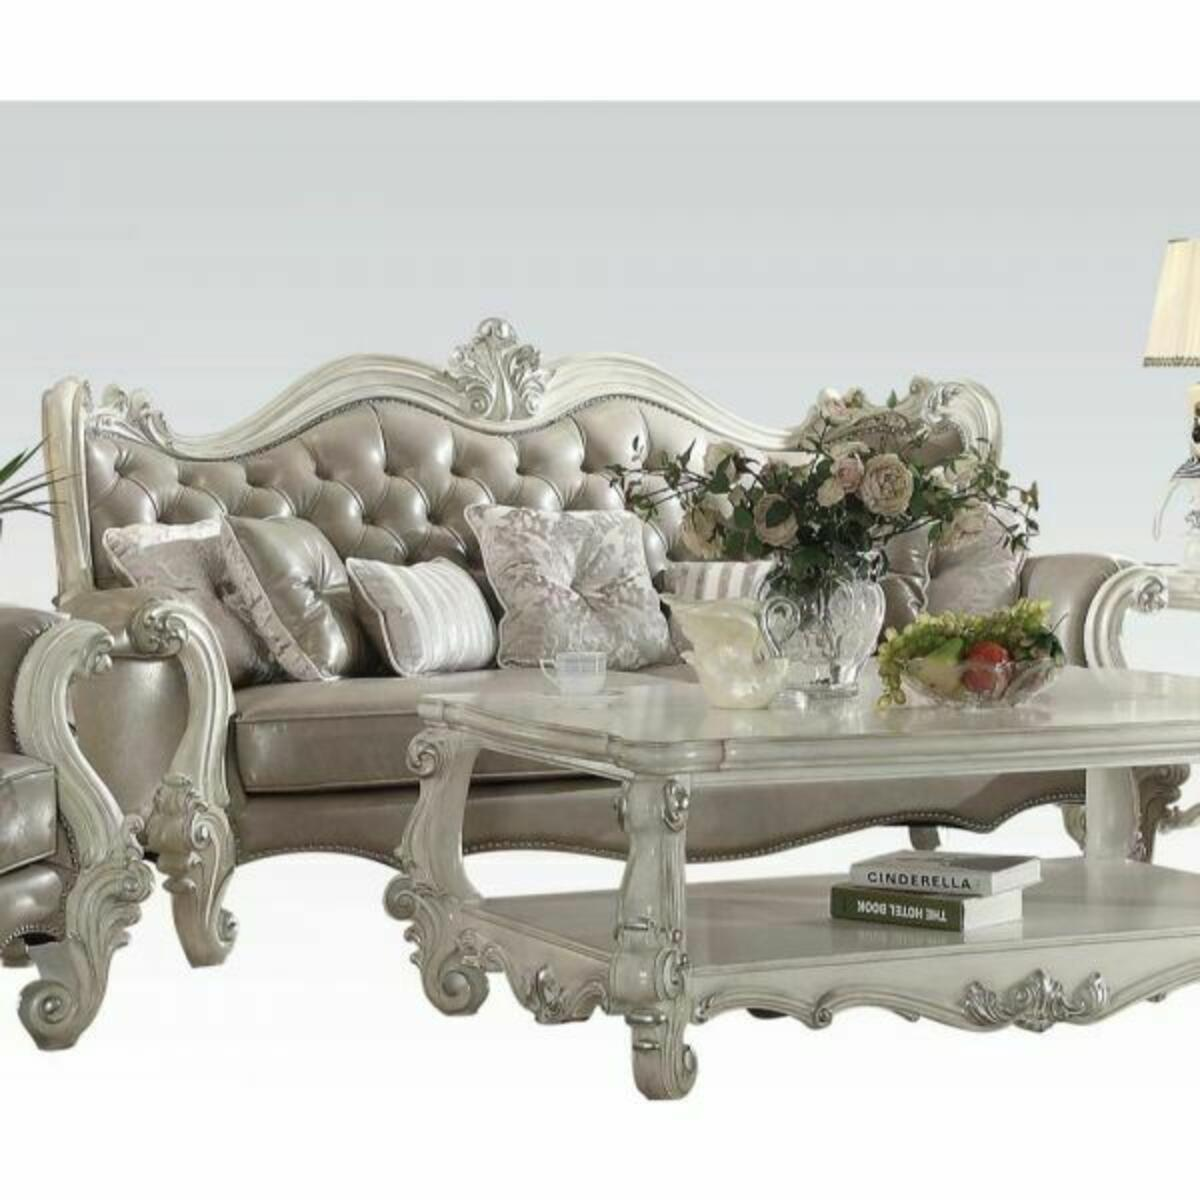 ACME Versailles Sofa w/7 Pillows - 52125A - Vintage Gray PU & Bone White